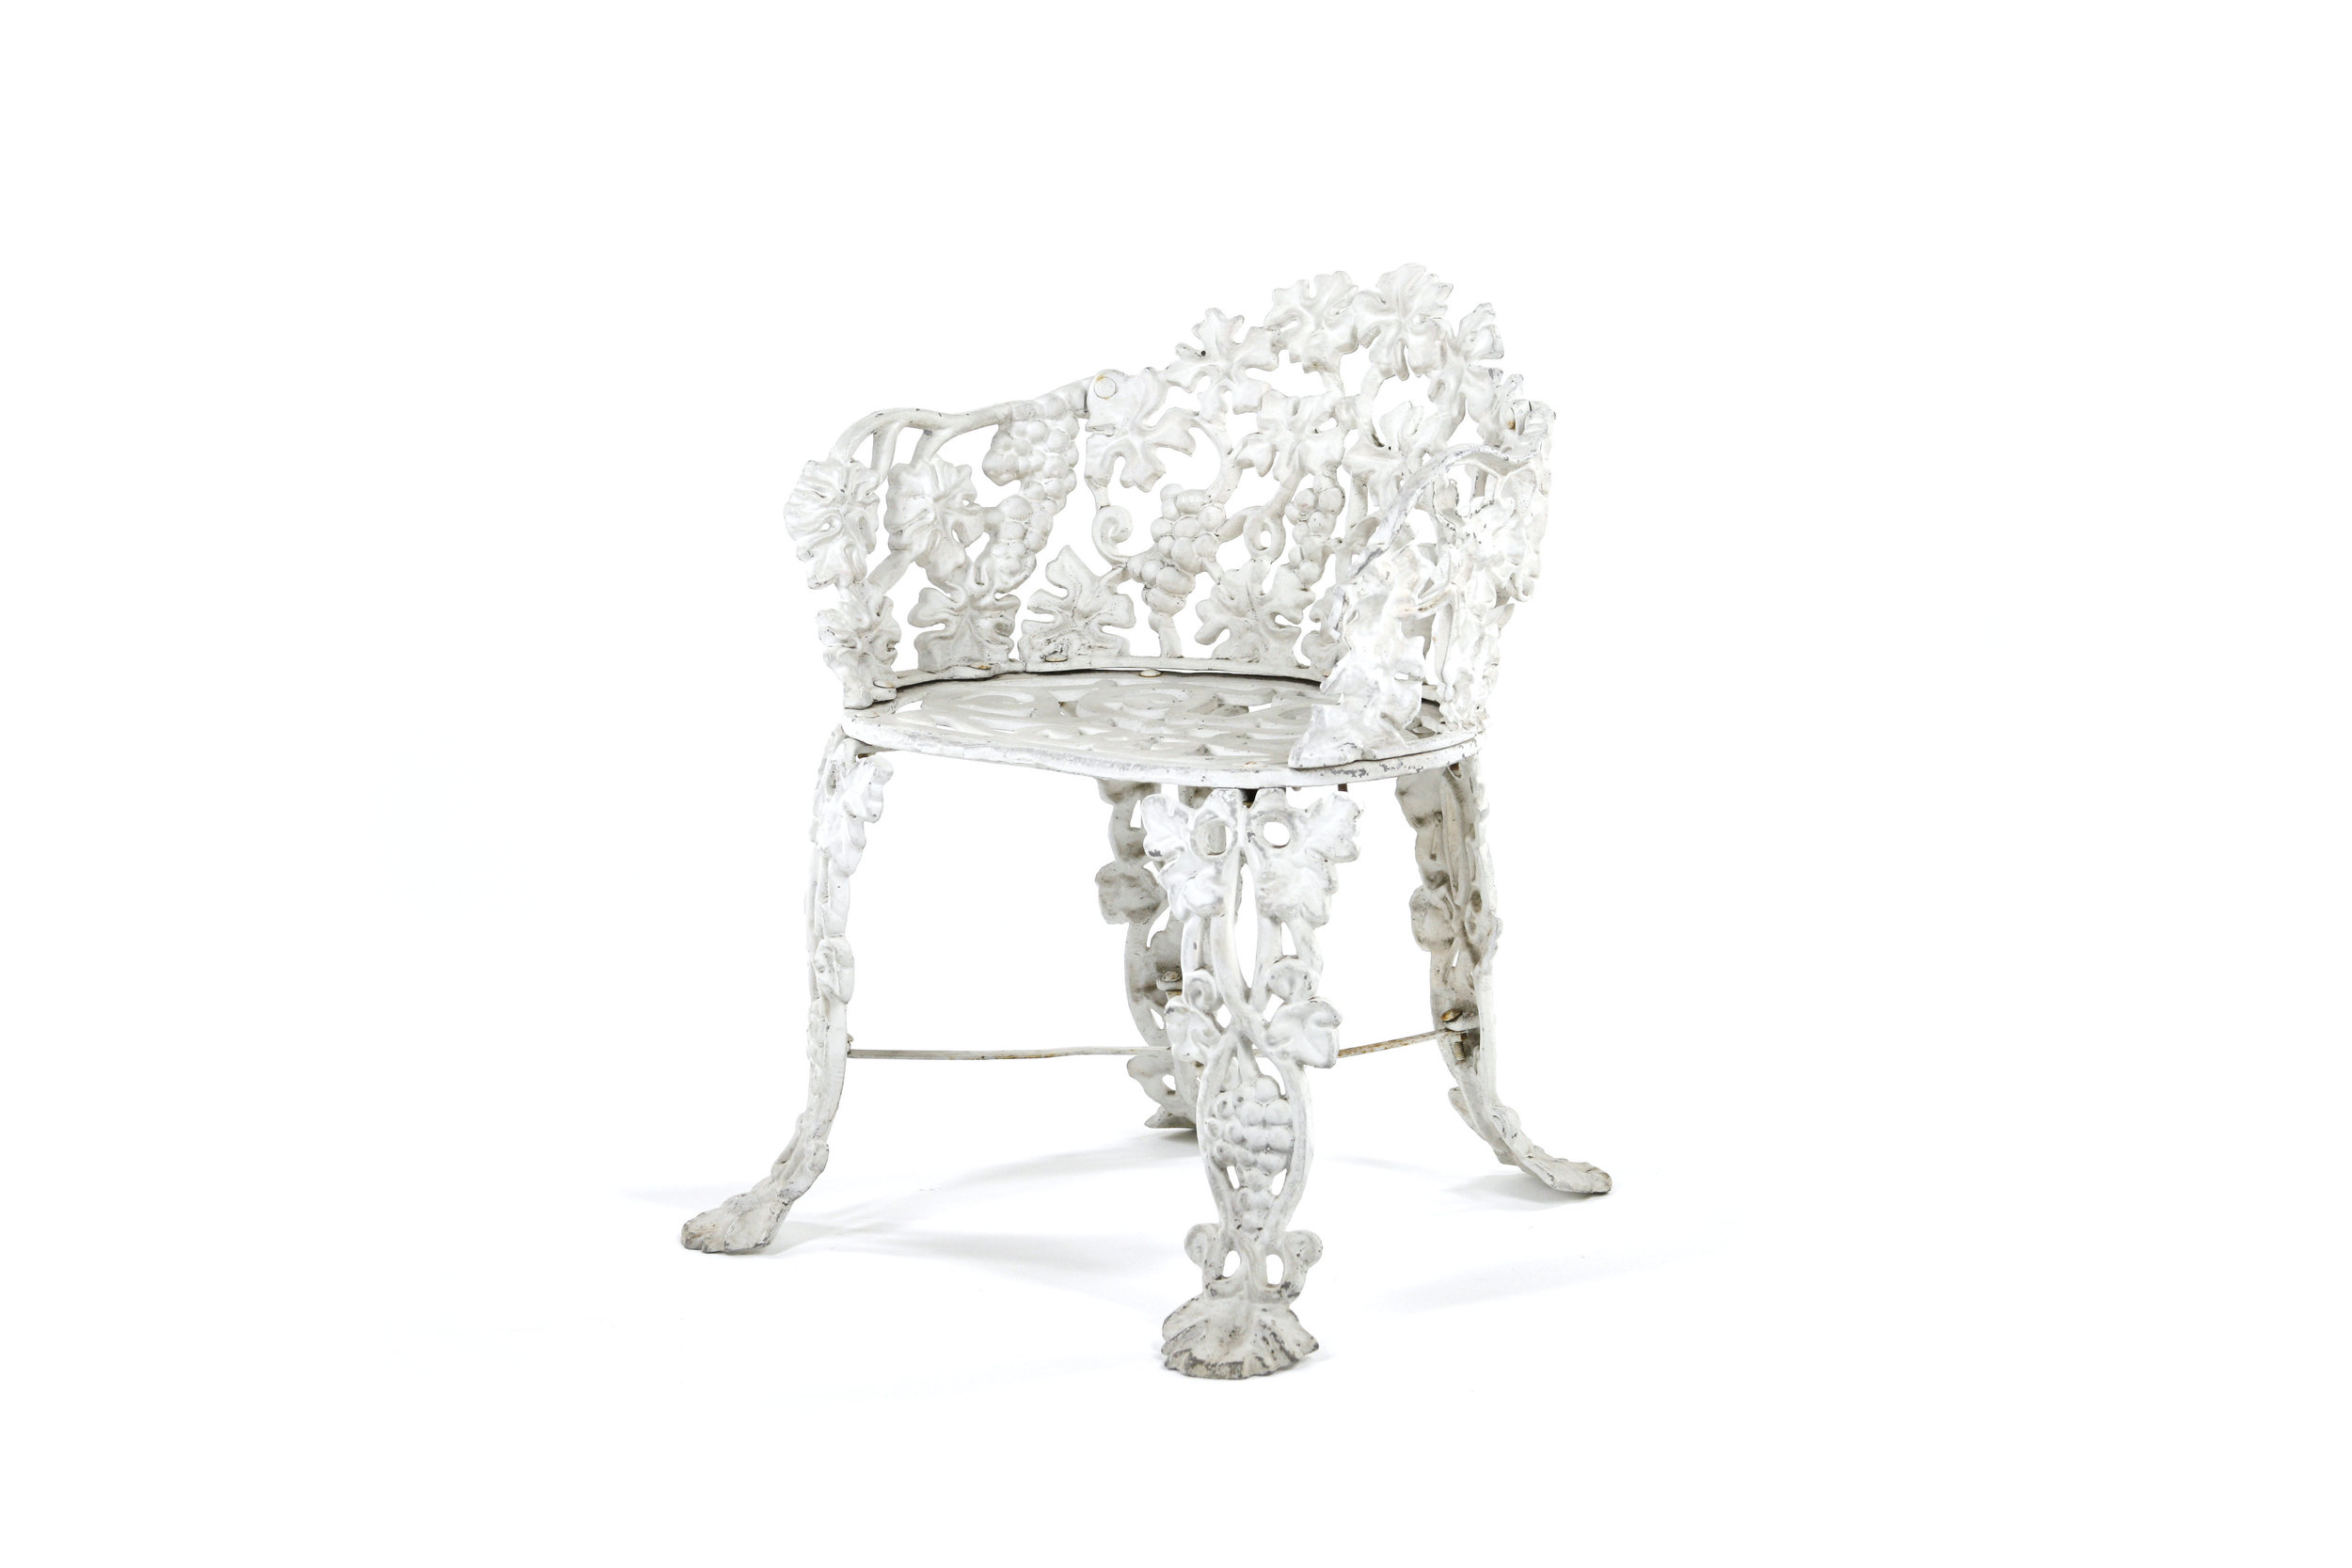 OrnateIronGardenFurniture_Chair2.jpg